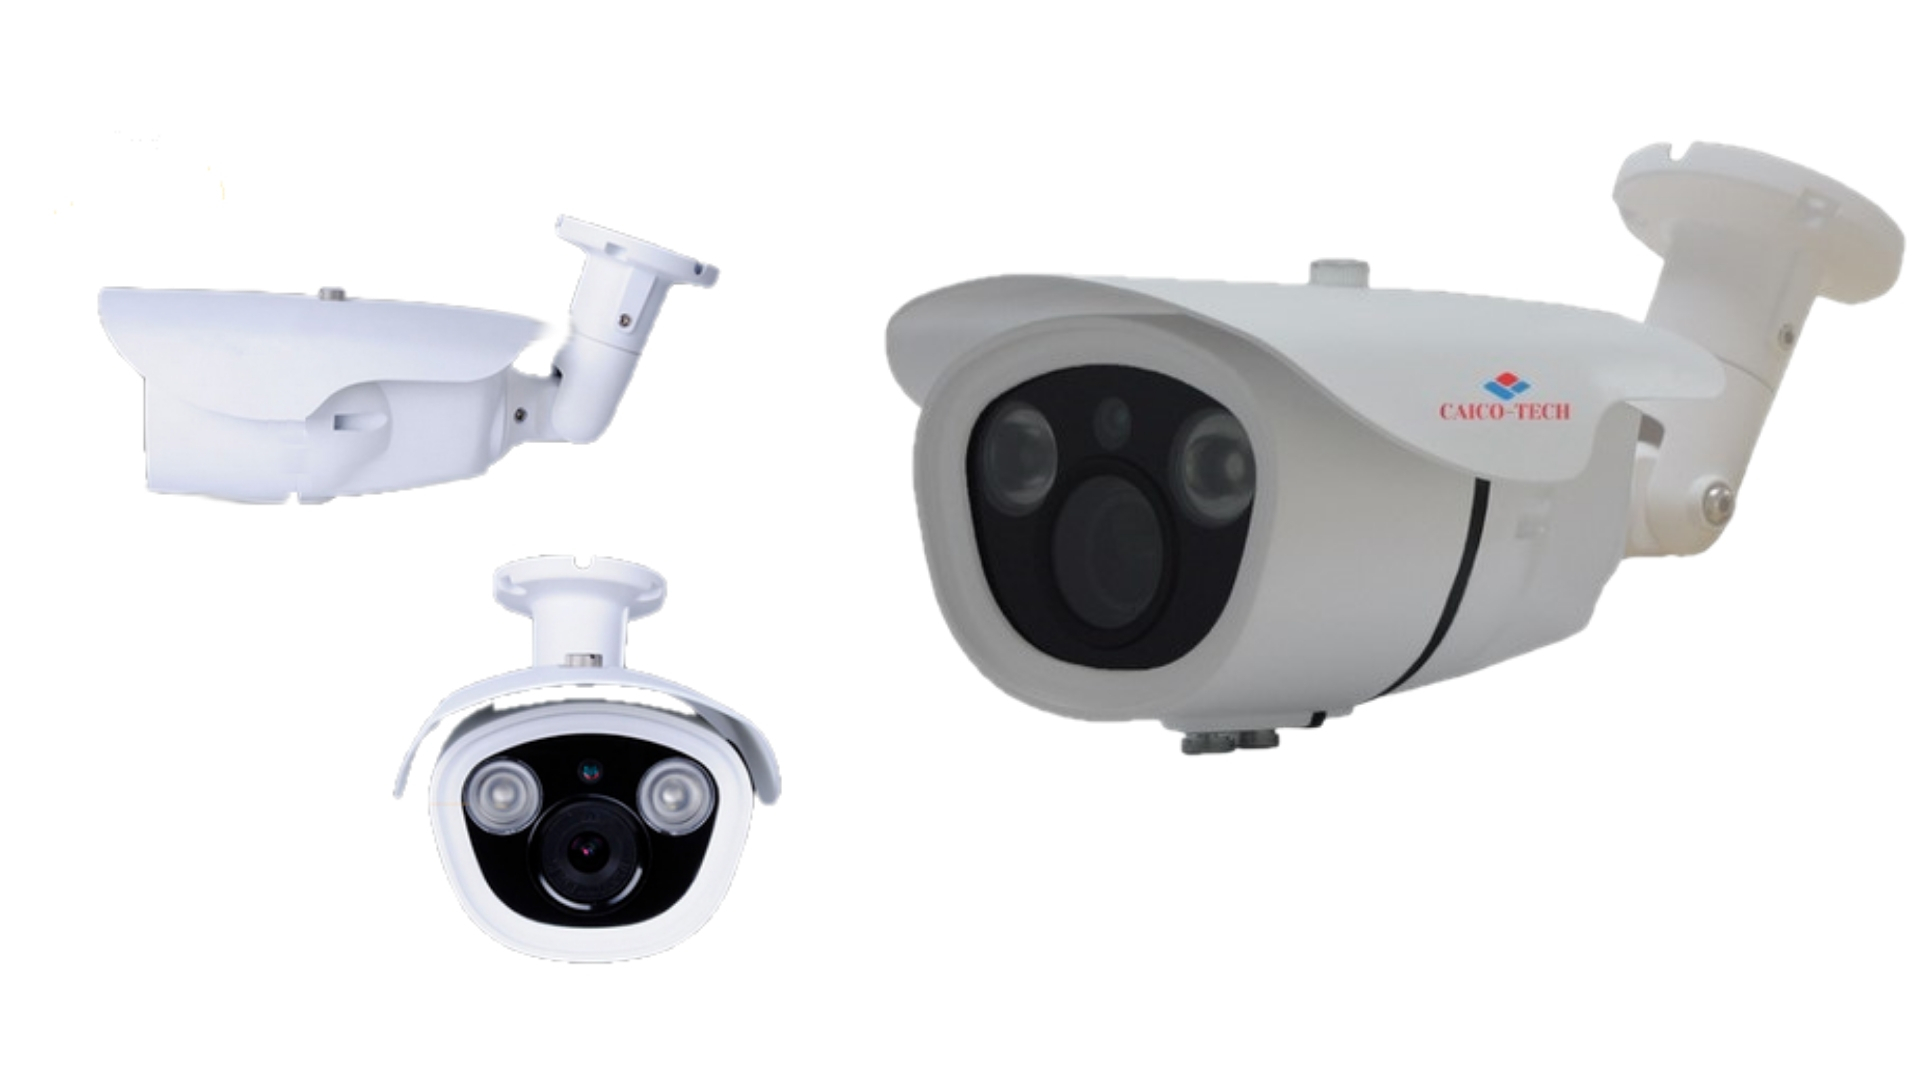 Уличная видеокамера CAICO TECH DSV-327A CMOS SONY IMX 327 ; 2Mpix